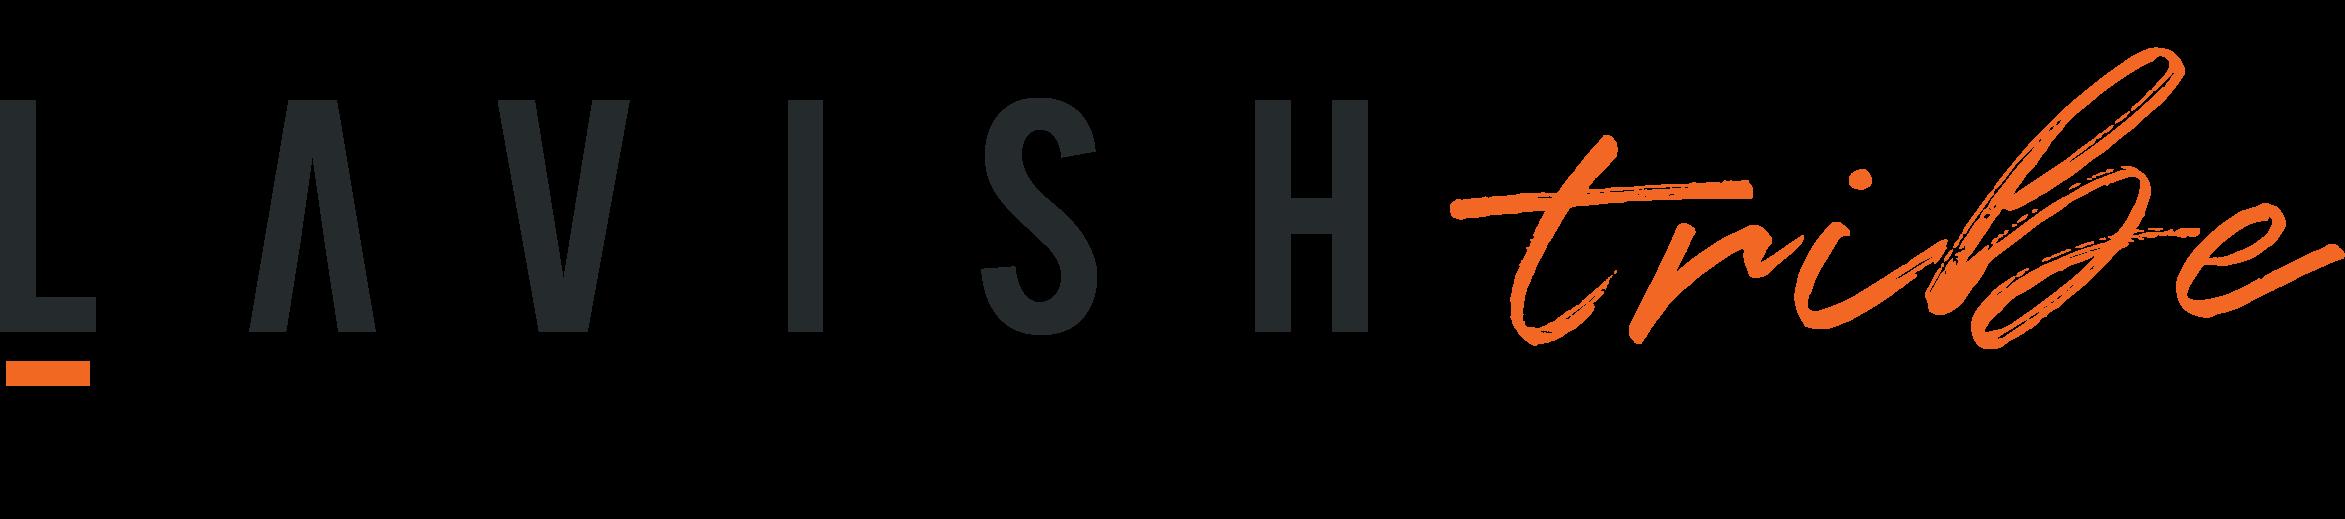 Direct Deposit Form — Lavish Tribe